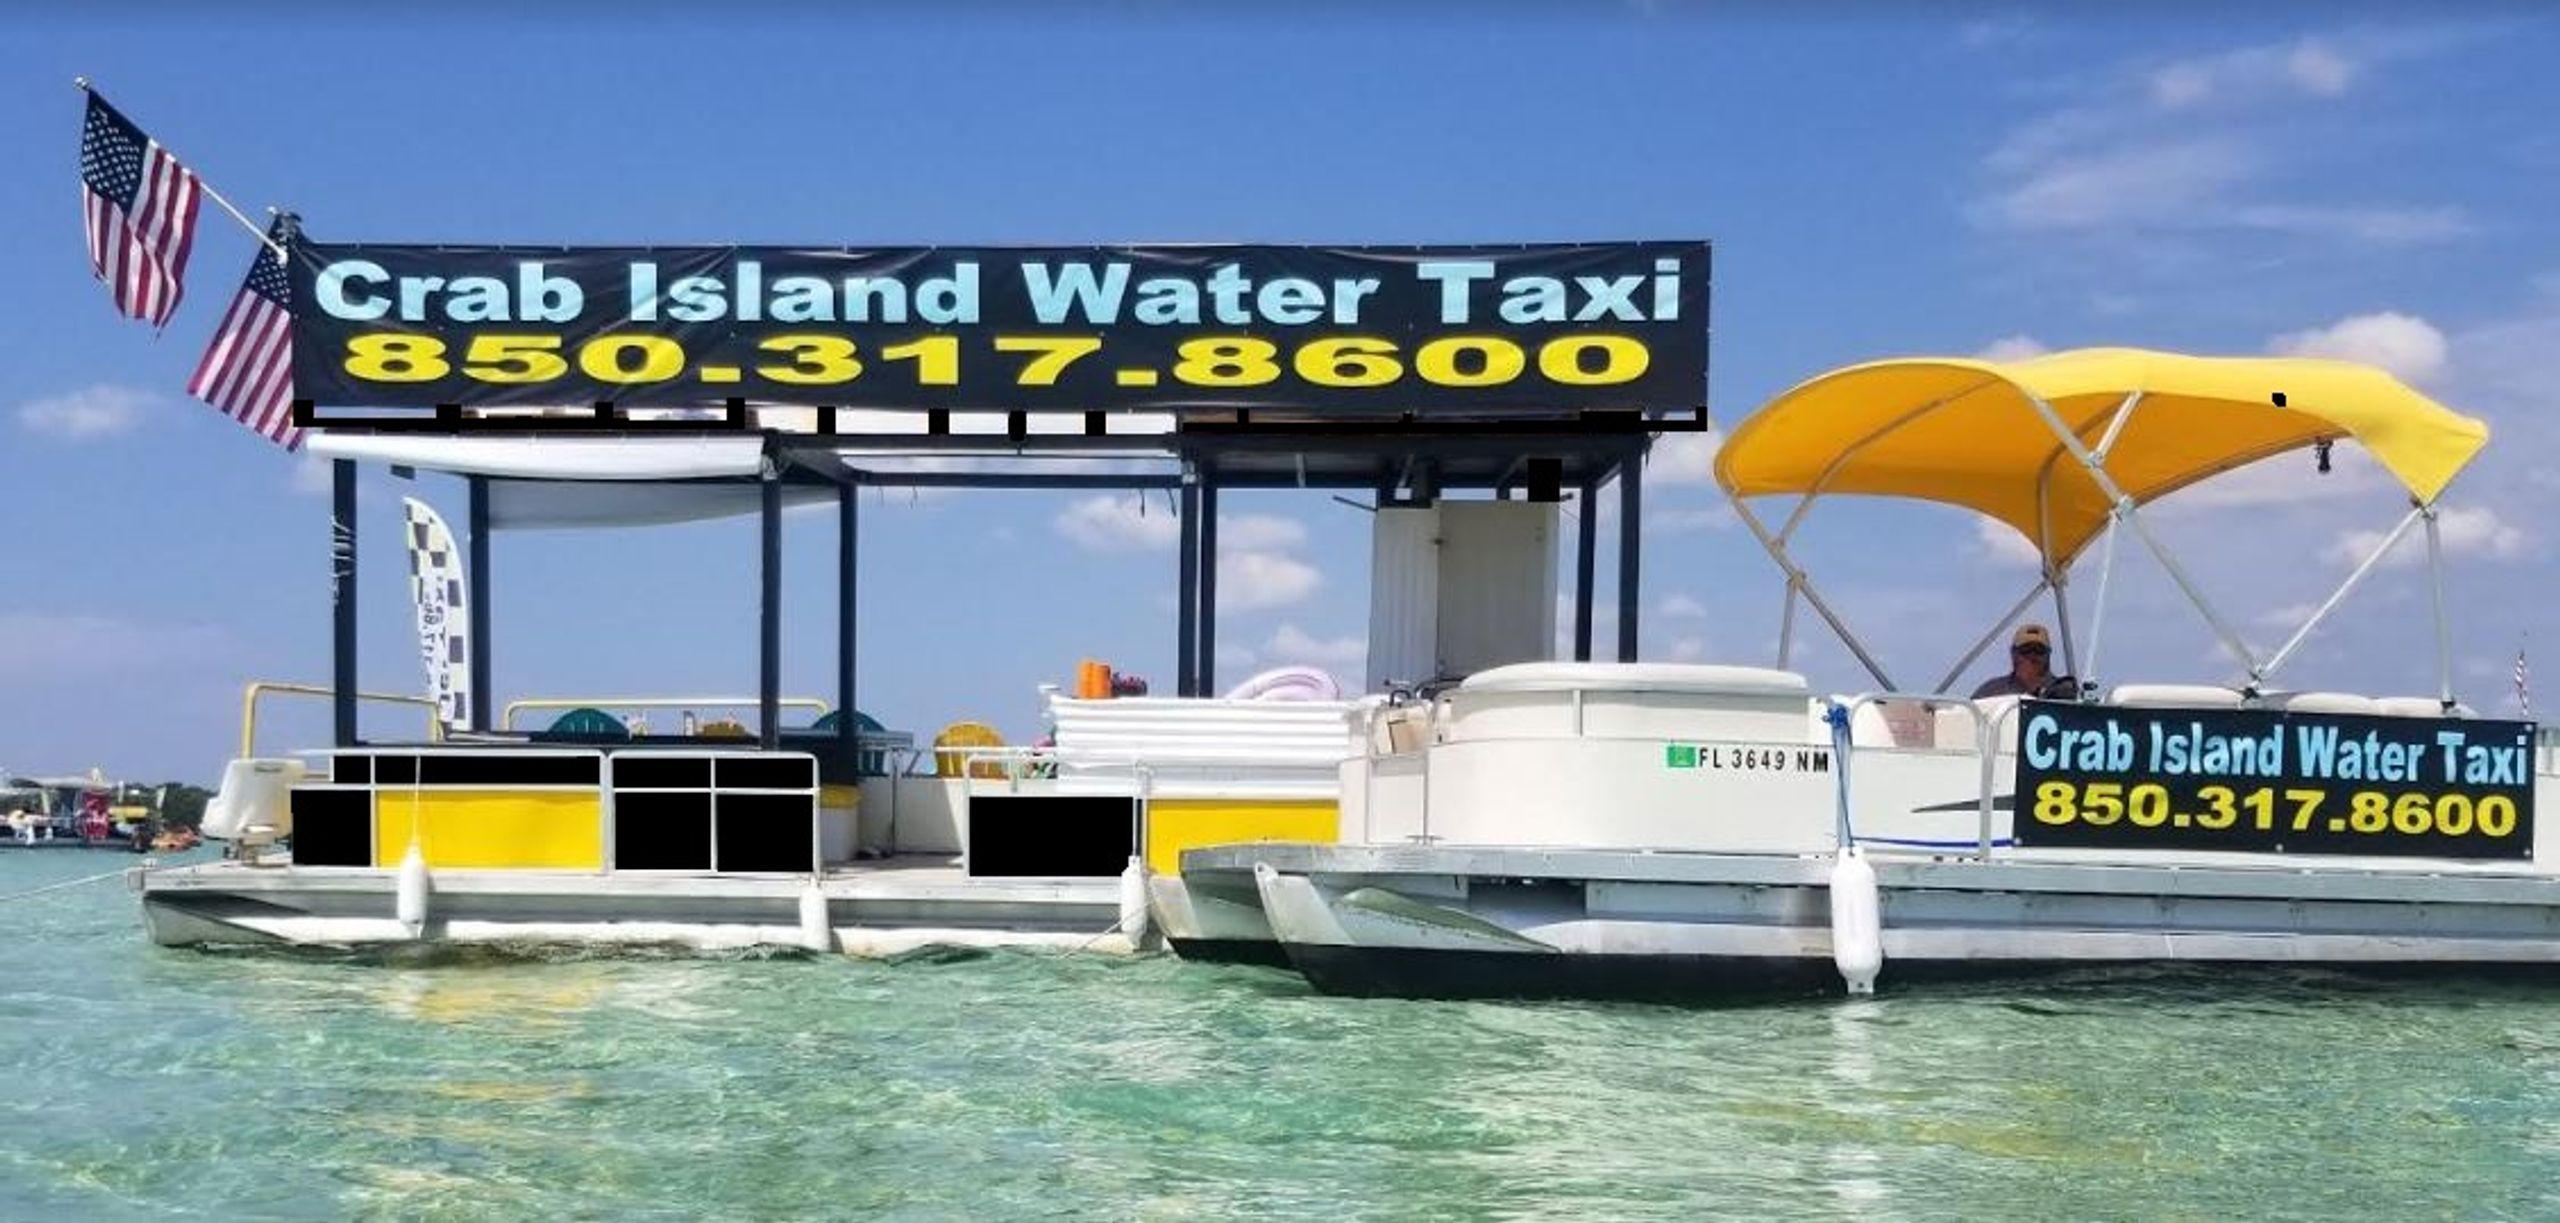 Pontoon Rentals Water Taxi Shuttle Crab Island Water